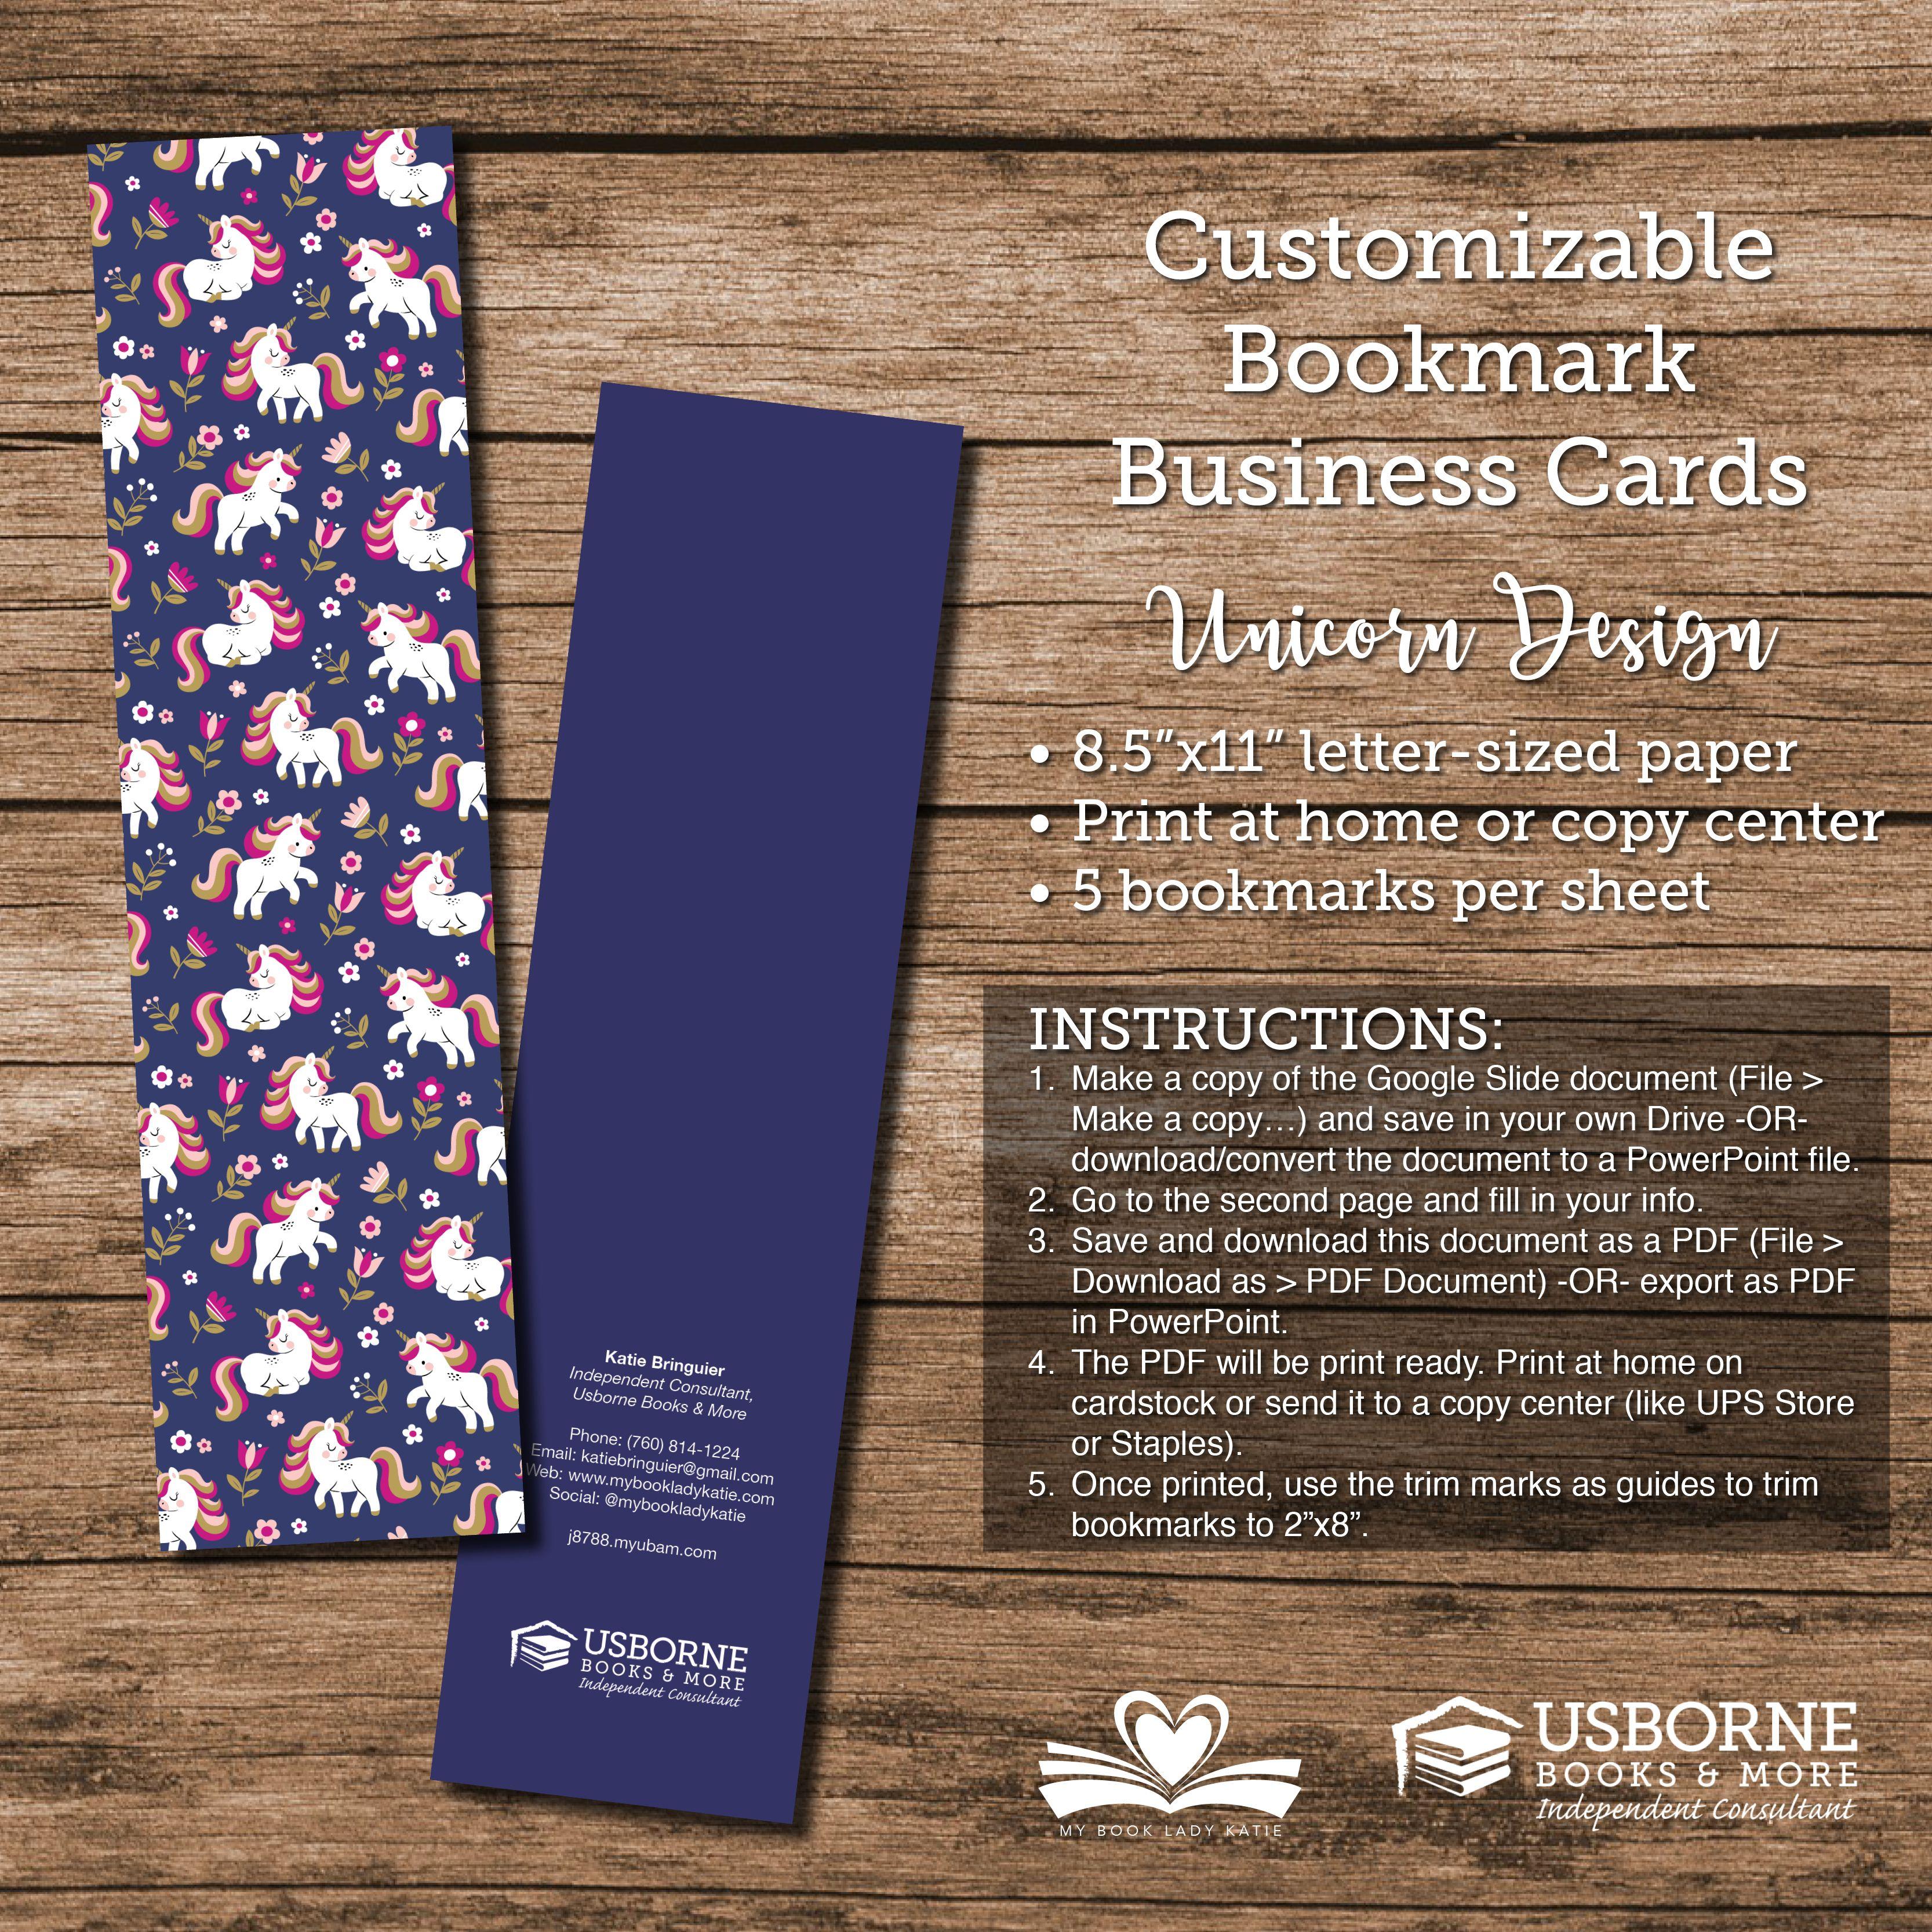 Customizable Bookmark Business Cards Usborne Letter Size Paper Bookmark